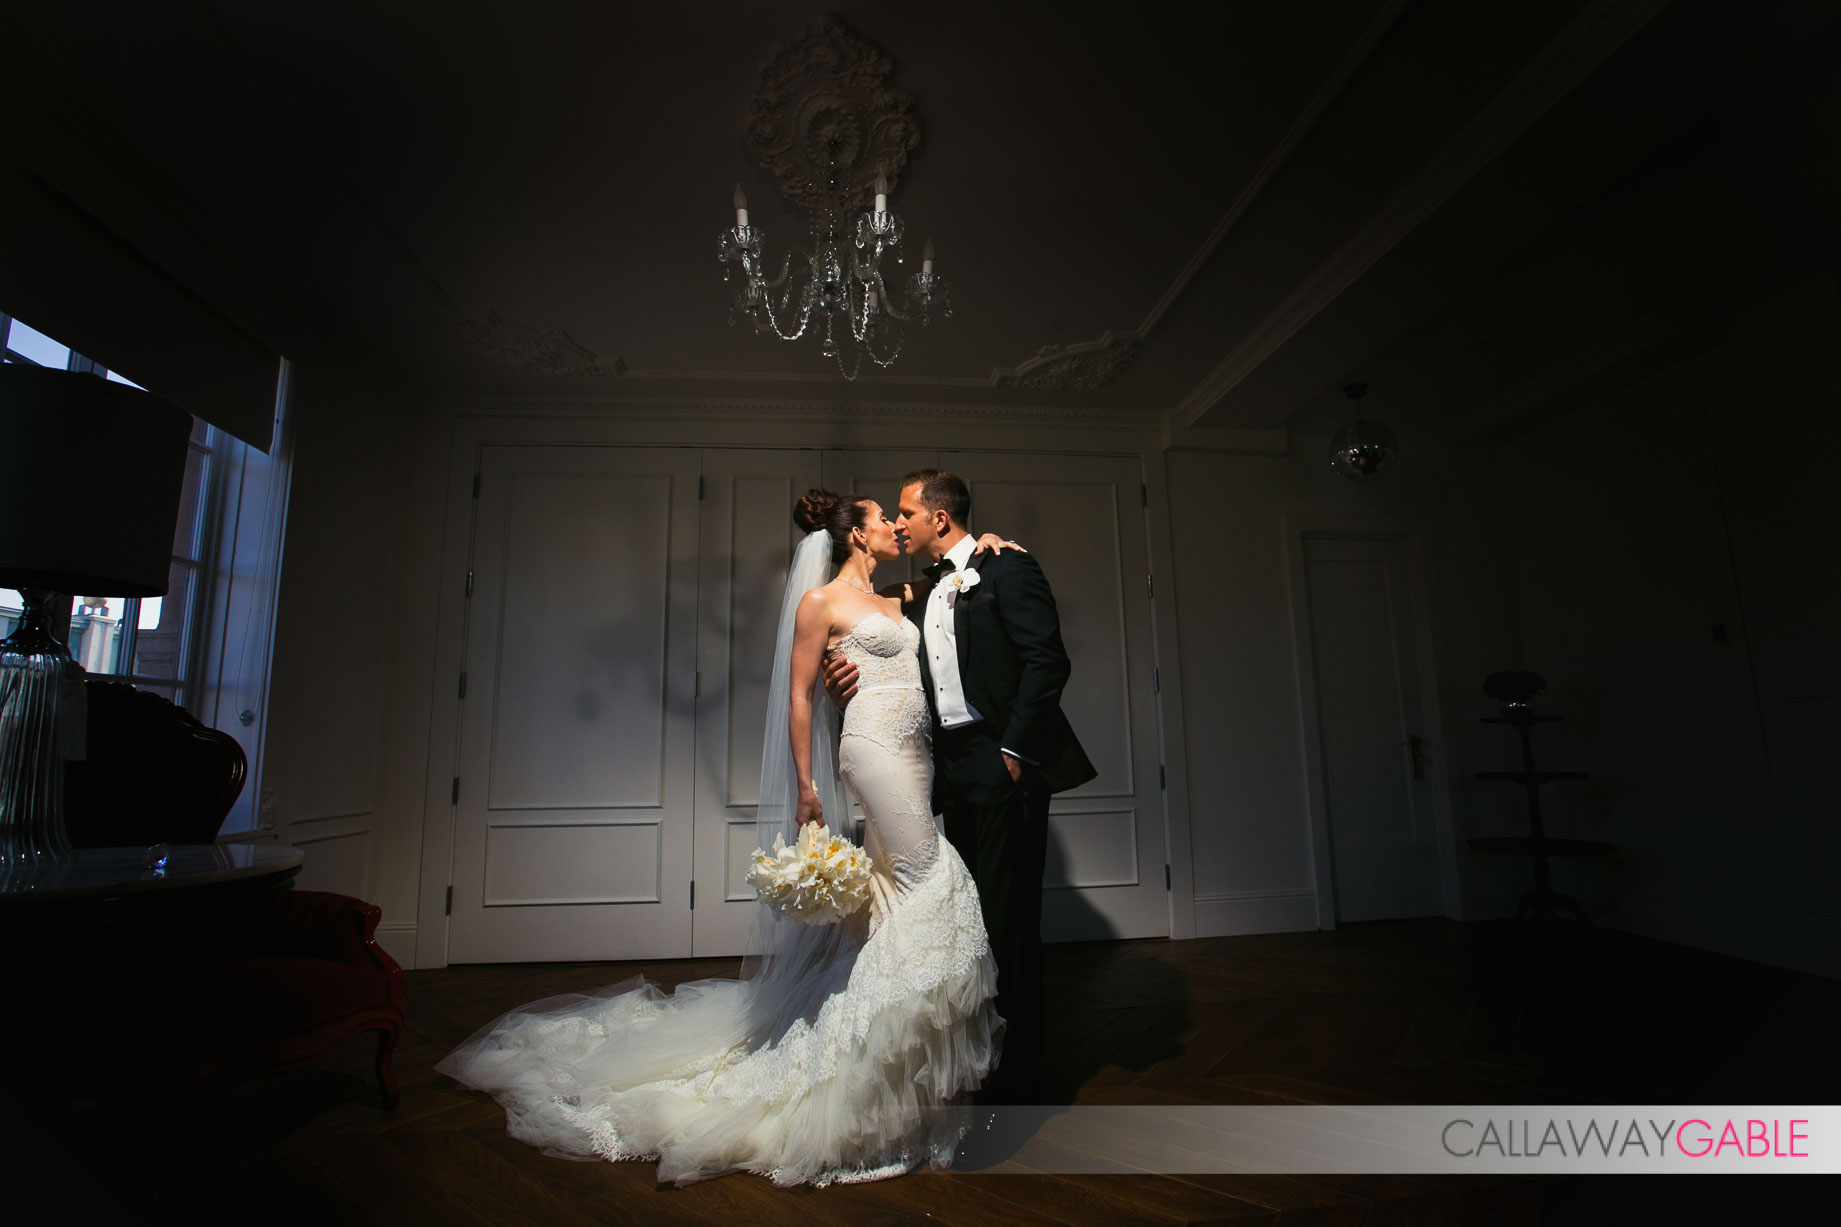 Amazing Bride and Groom wedding portrait at Culver Hotel